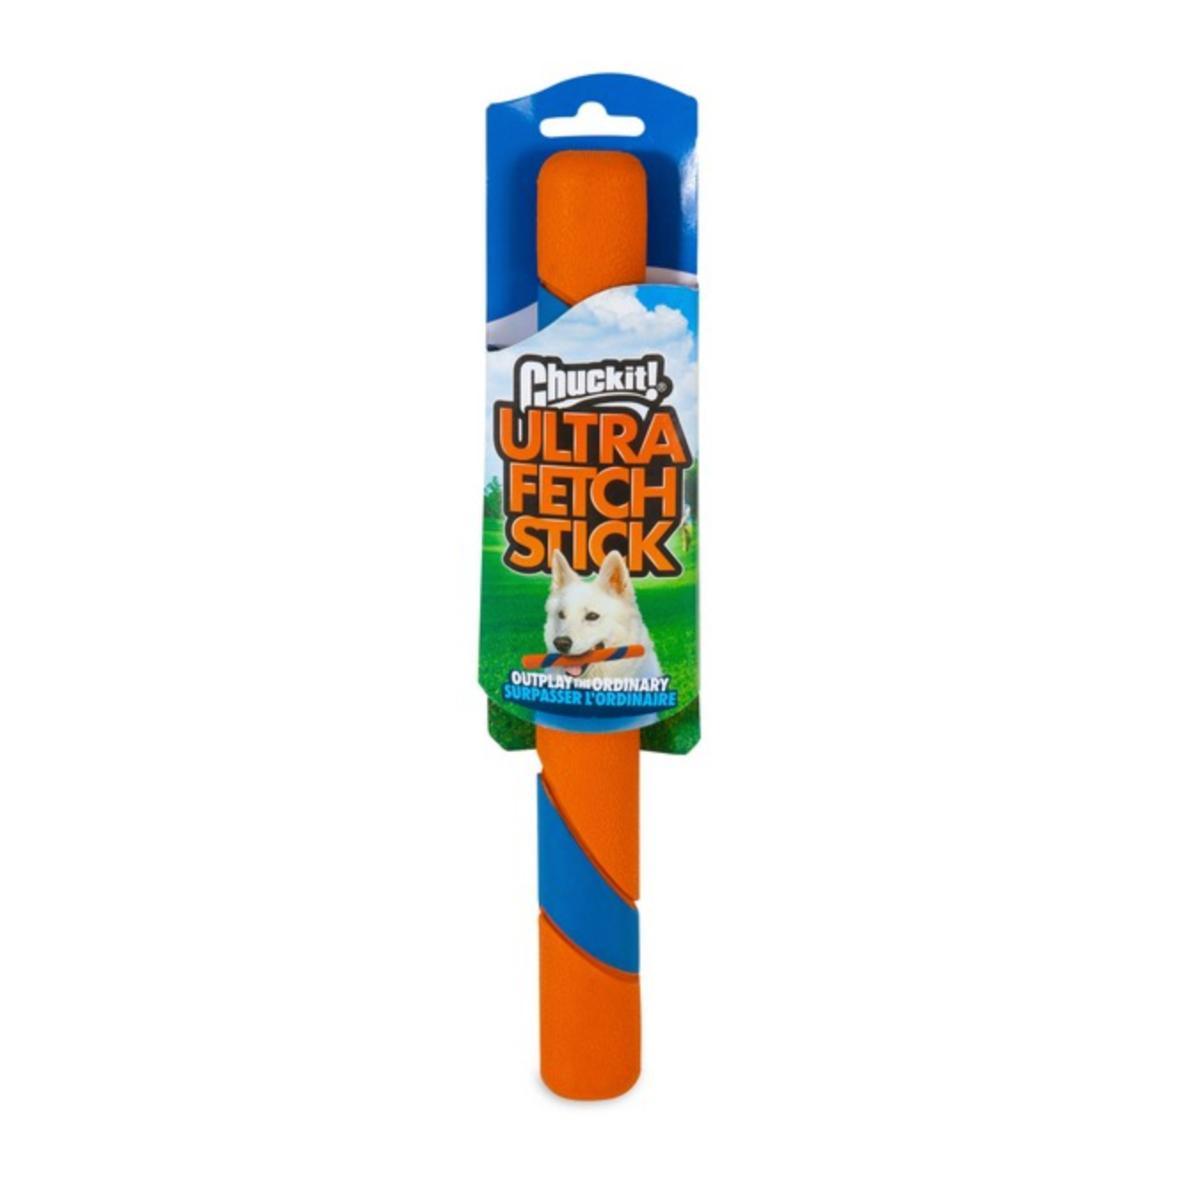 Chuckit! Ultra Fetch Stick 28cm